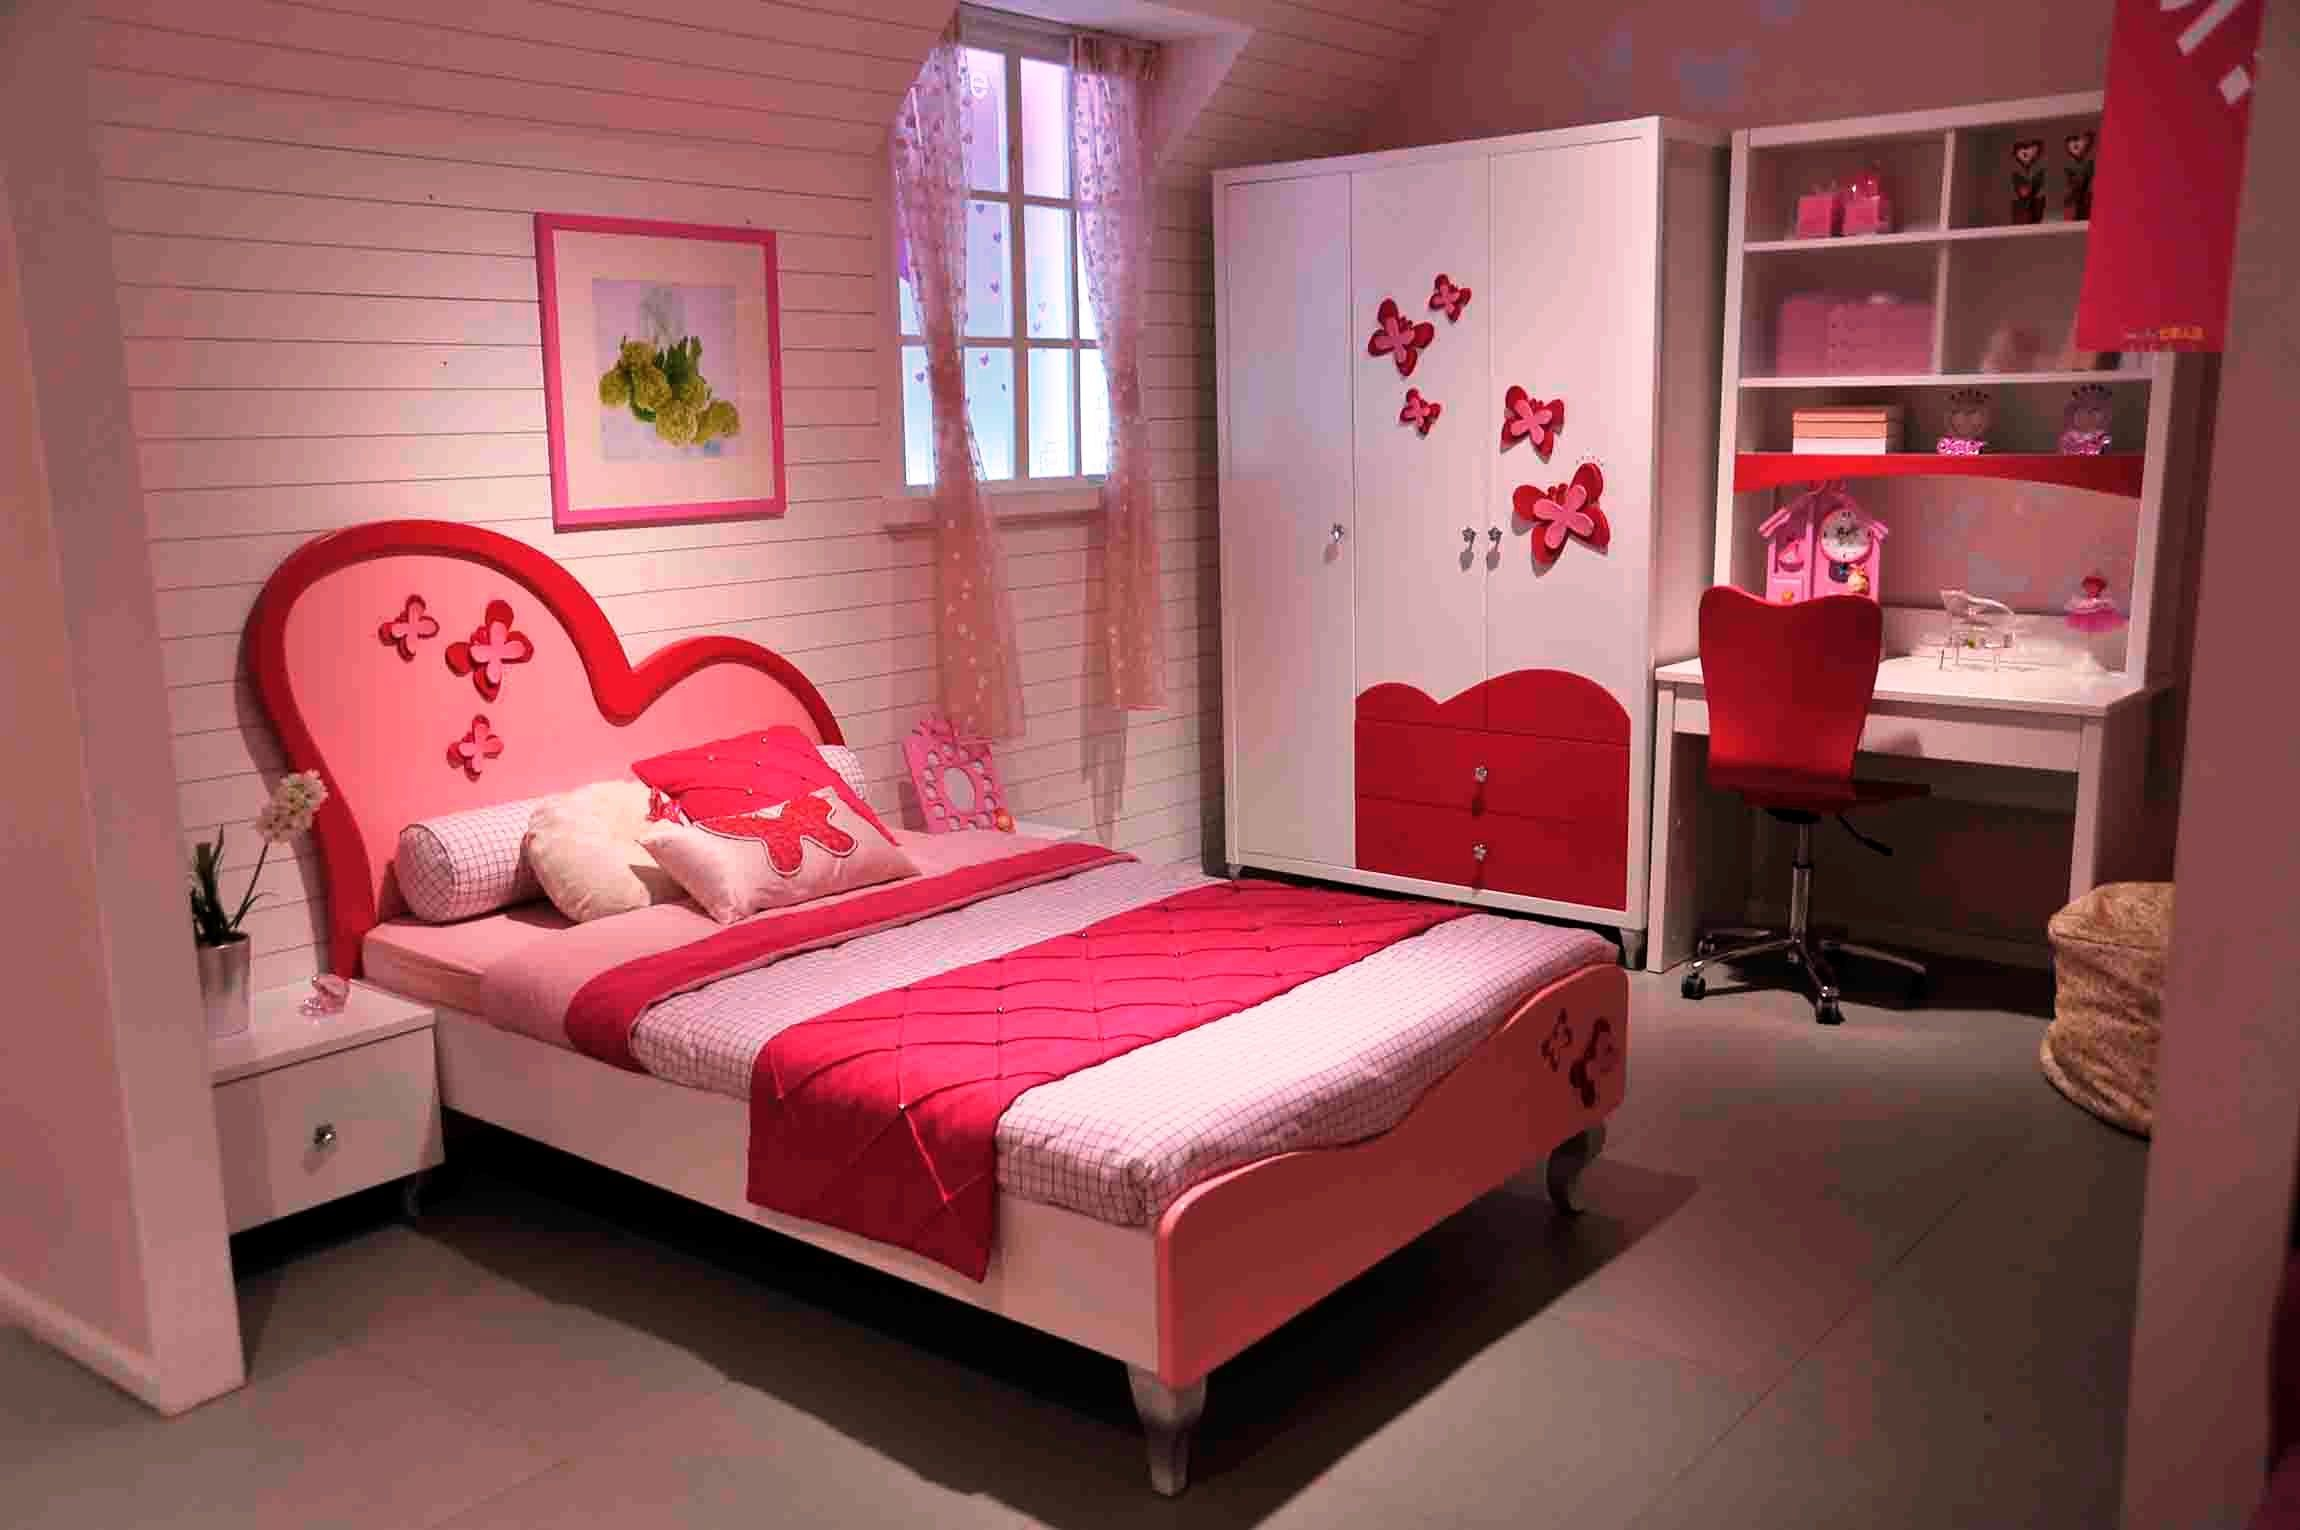 بالصور صور غرف نوم بنات , اجمل غرفة نوم بنات 2019 4563 8